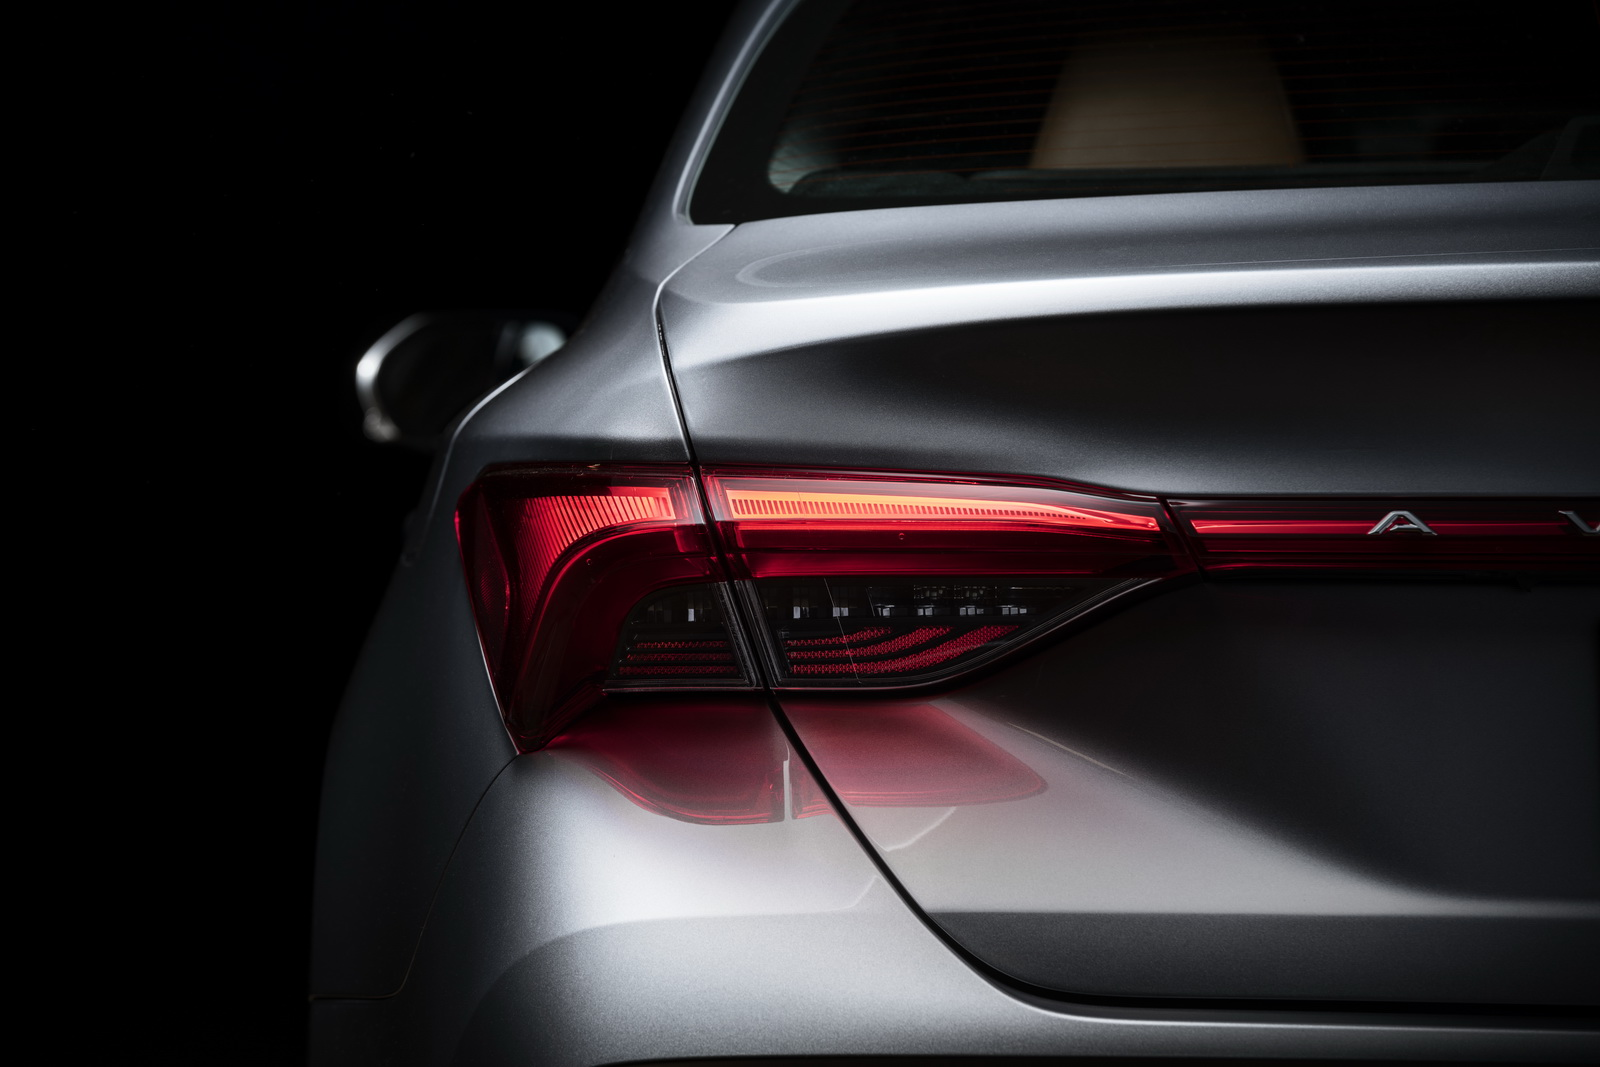 Toyota Avalon 2019 (10)